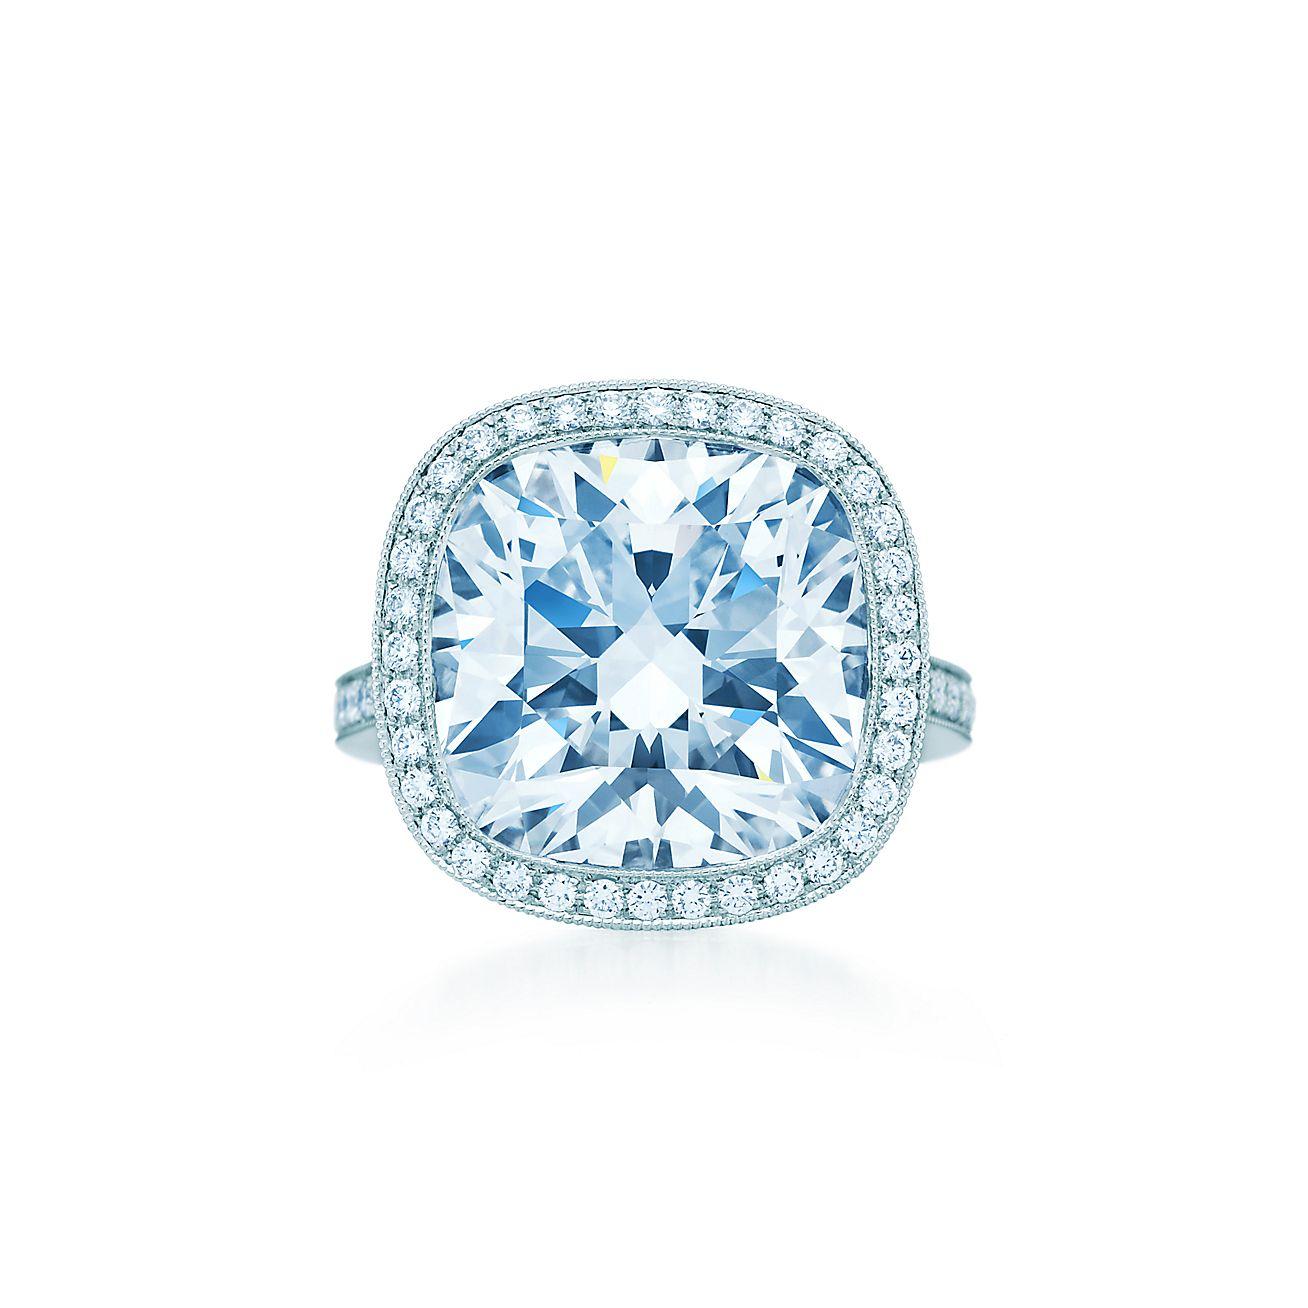 Cushion Cut Diamond Ring In Platinum With Round Brilliant Diamonds Tiffany Co